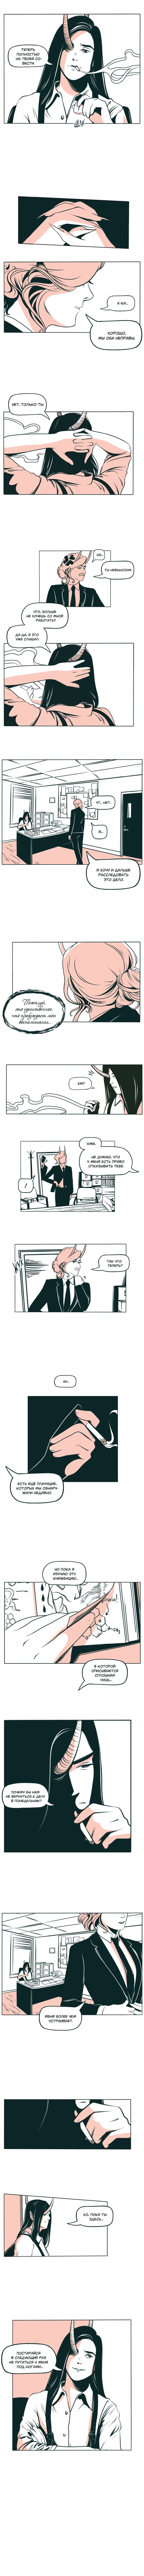 https://r1.ninemanga.com/comics/pic2/0/33536/420929/1534437827316.jpg Page 4